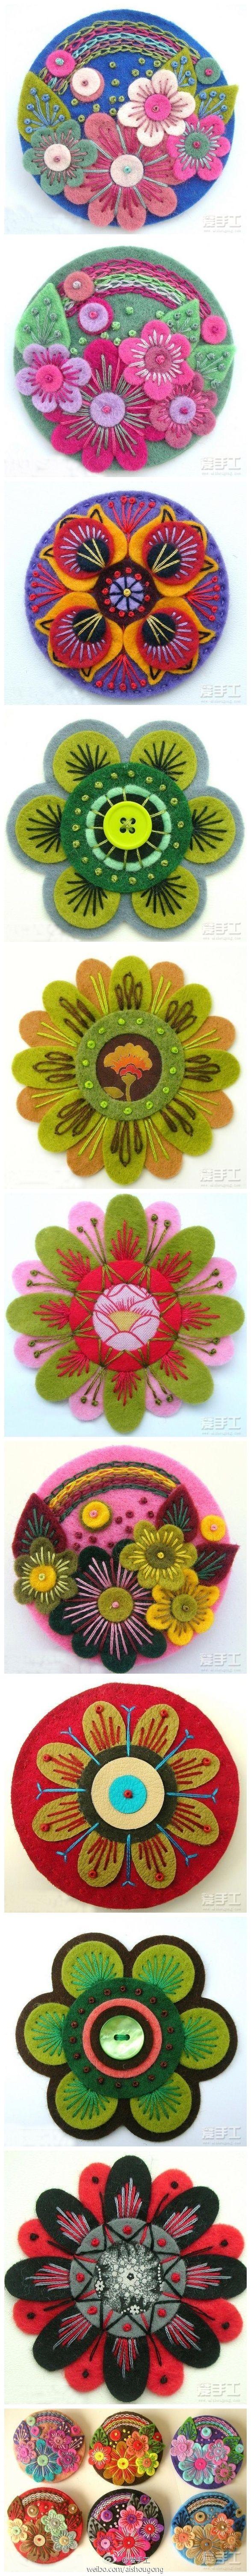 [Foreign] non-woven non-woven enjoy exquisite handmade from love - microblogging